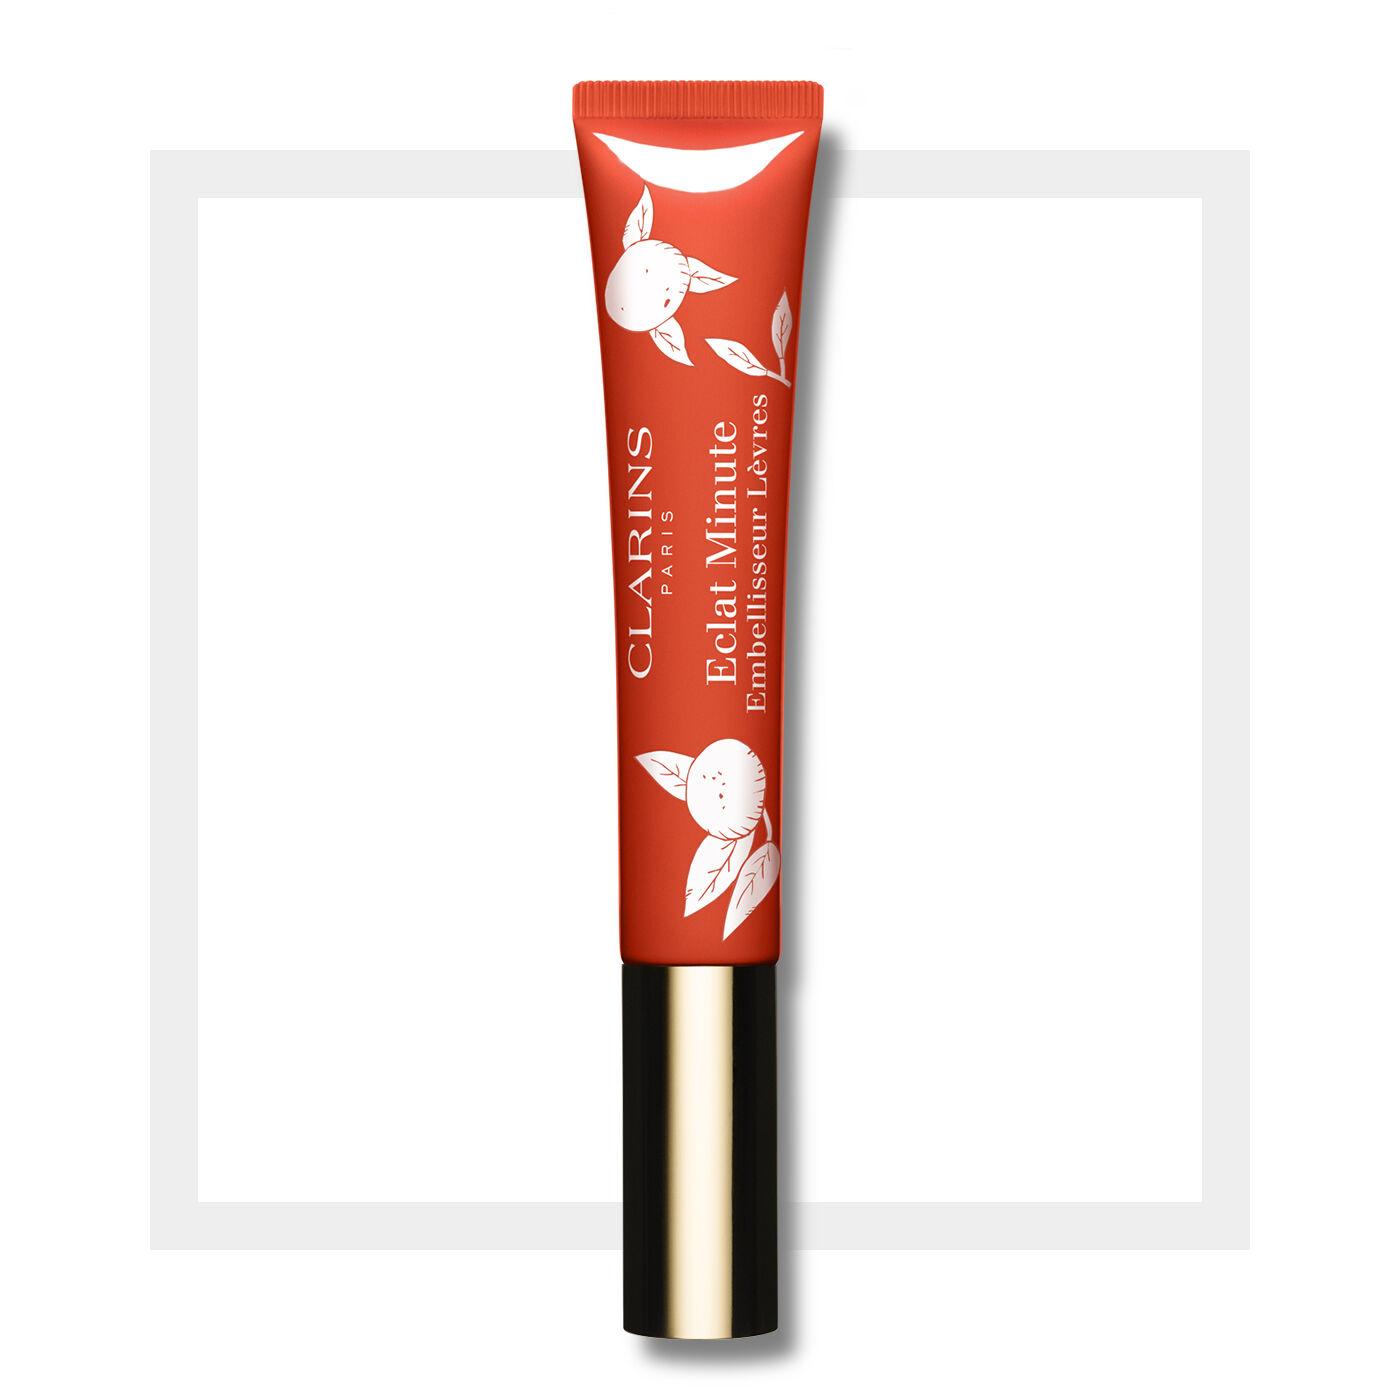 Lippen-Highlighter%20Eclat%20Minute%20Embellisseur%20L%C3%A8vres